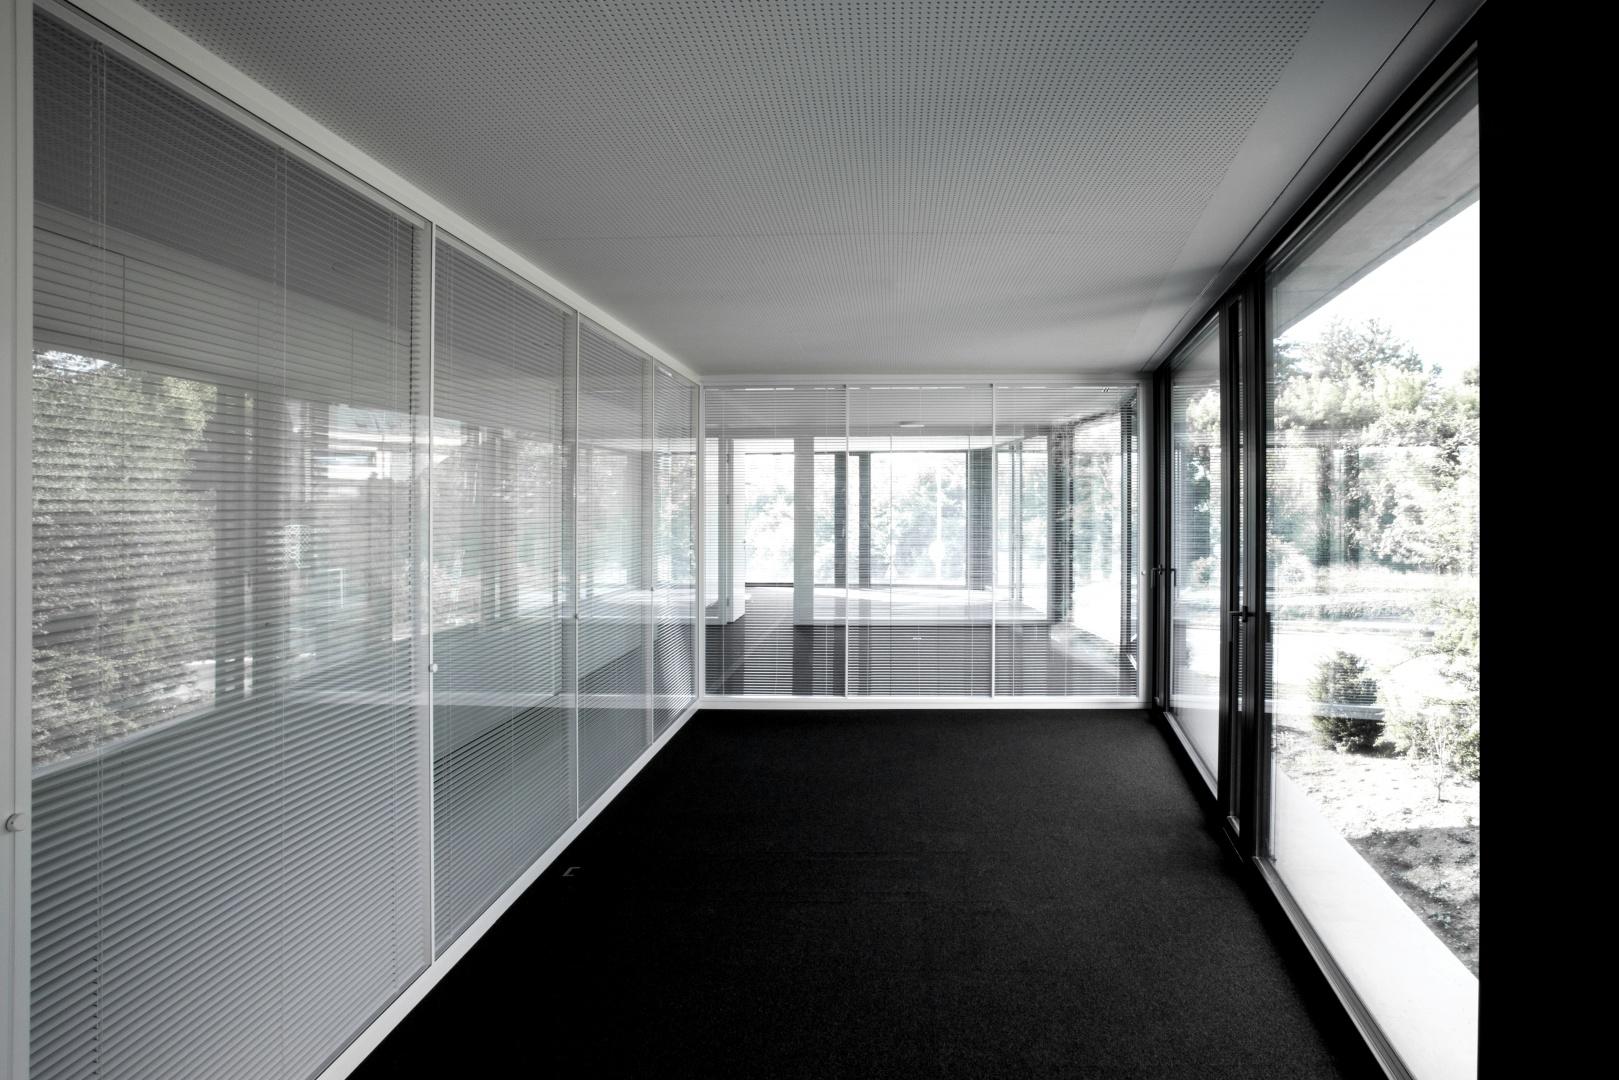 Versammlungssaal © Fruehauf, Henry & Viladoms